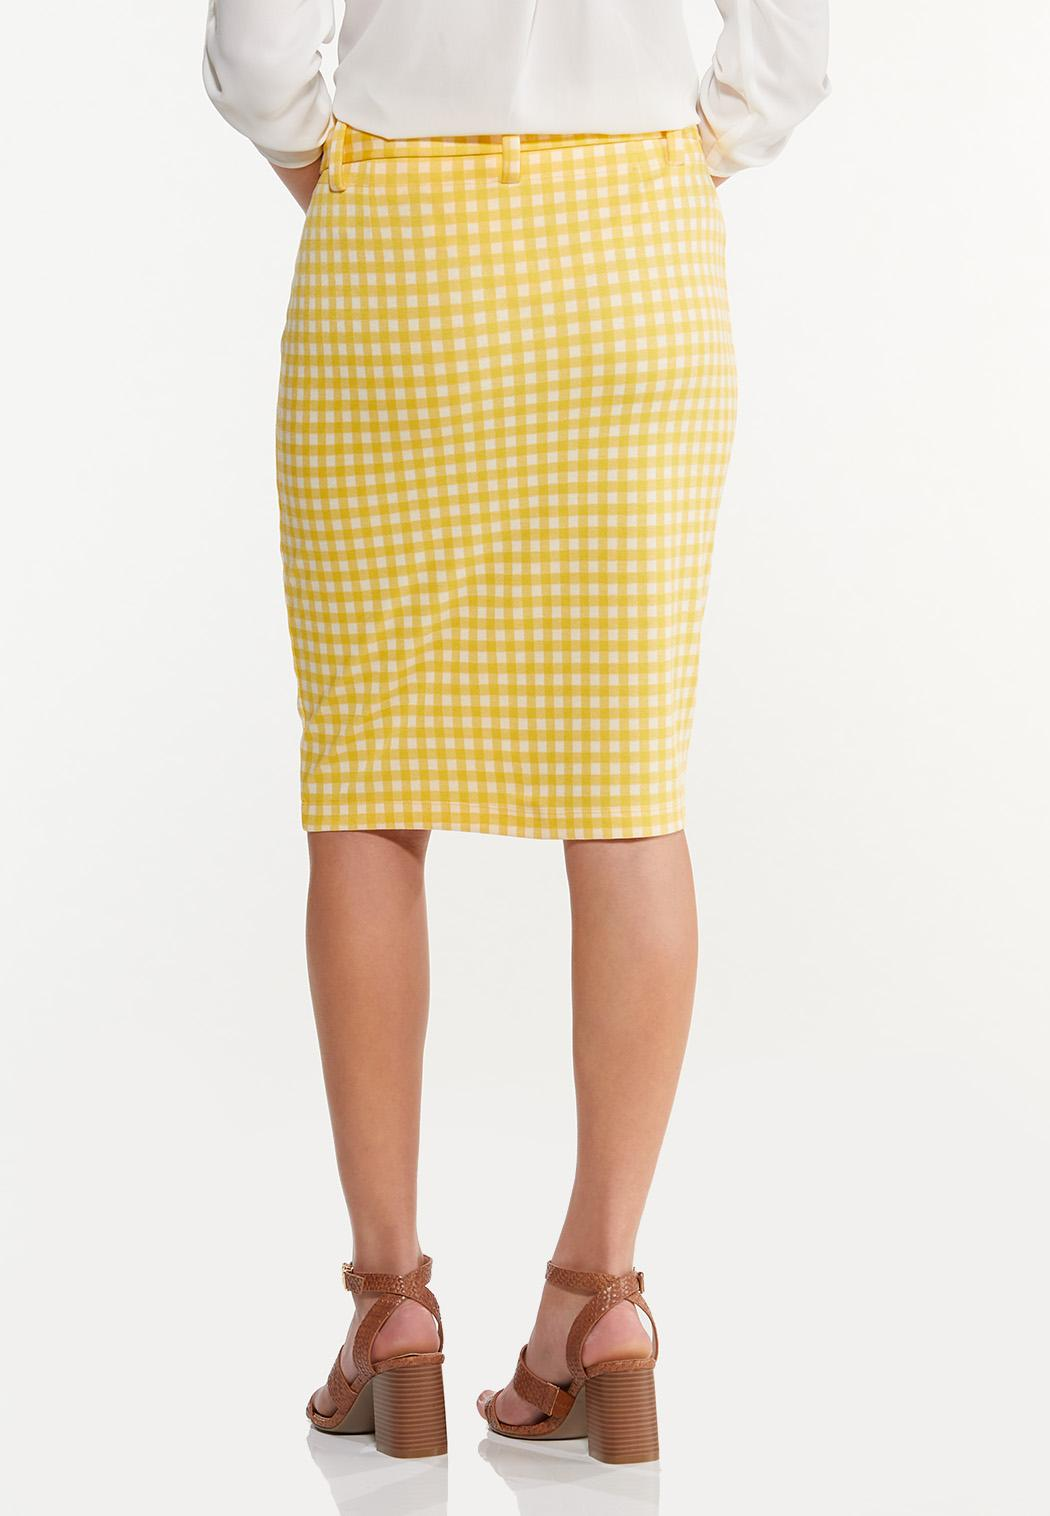 Plus Size Gold Gingham Skirt (Item #44493903)